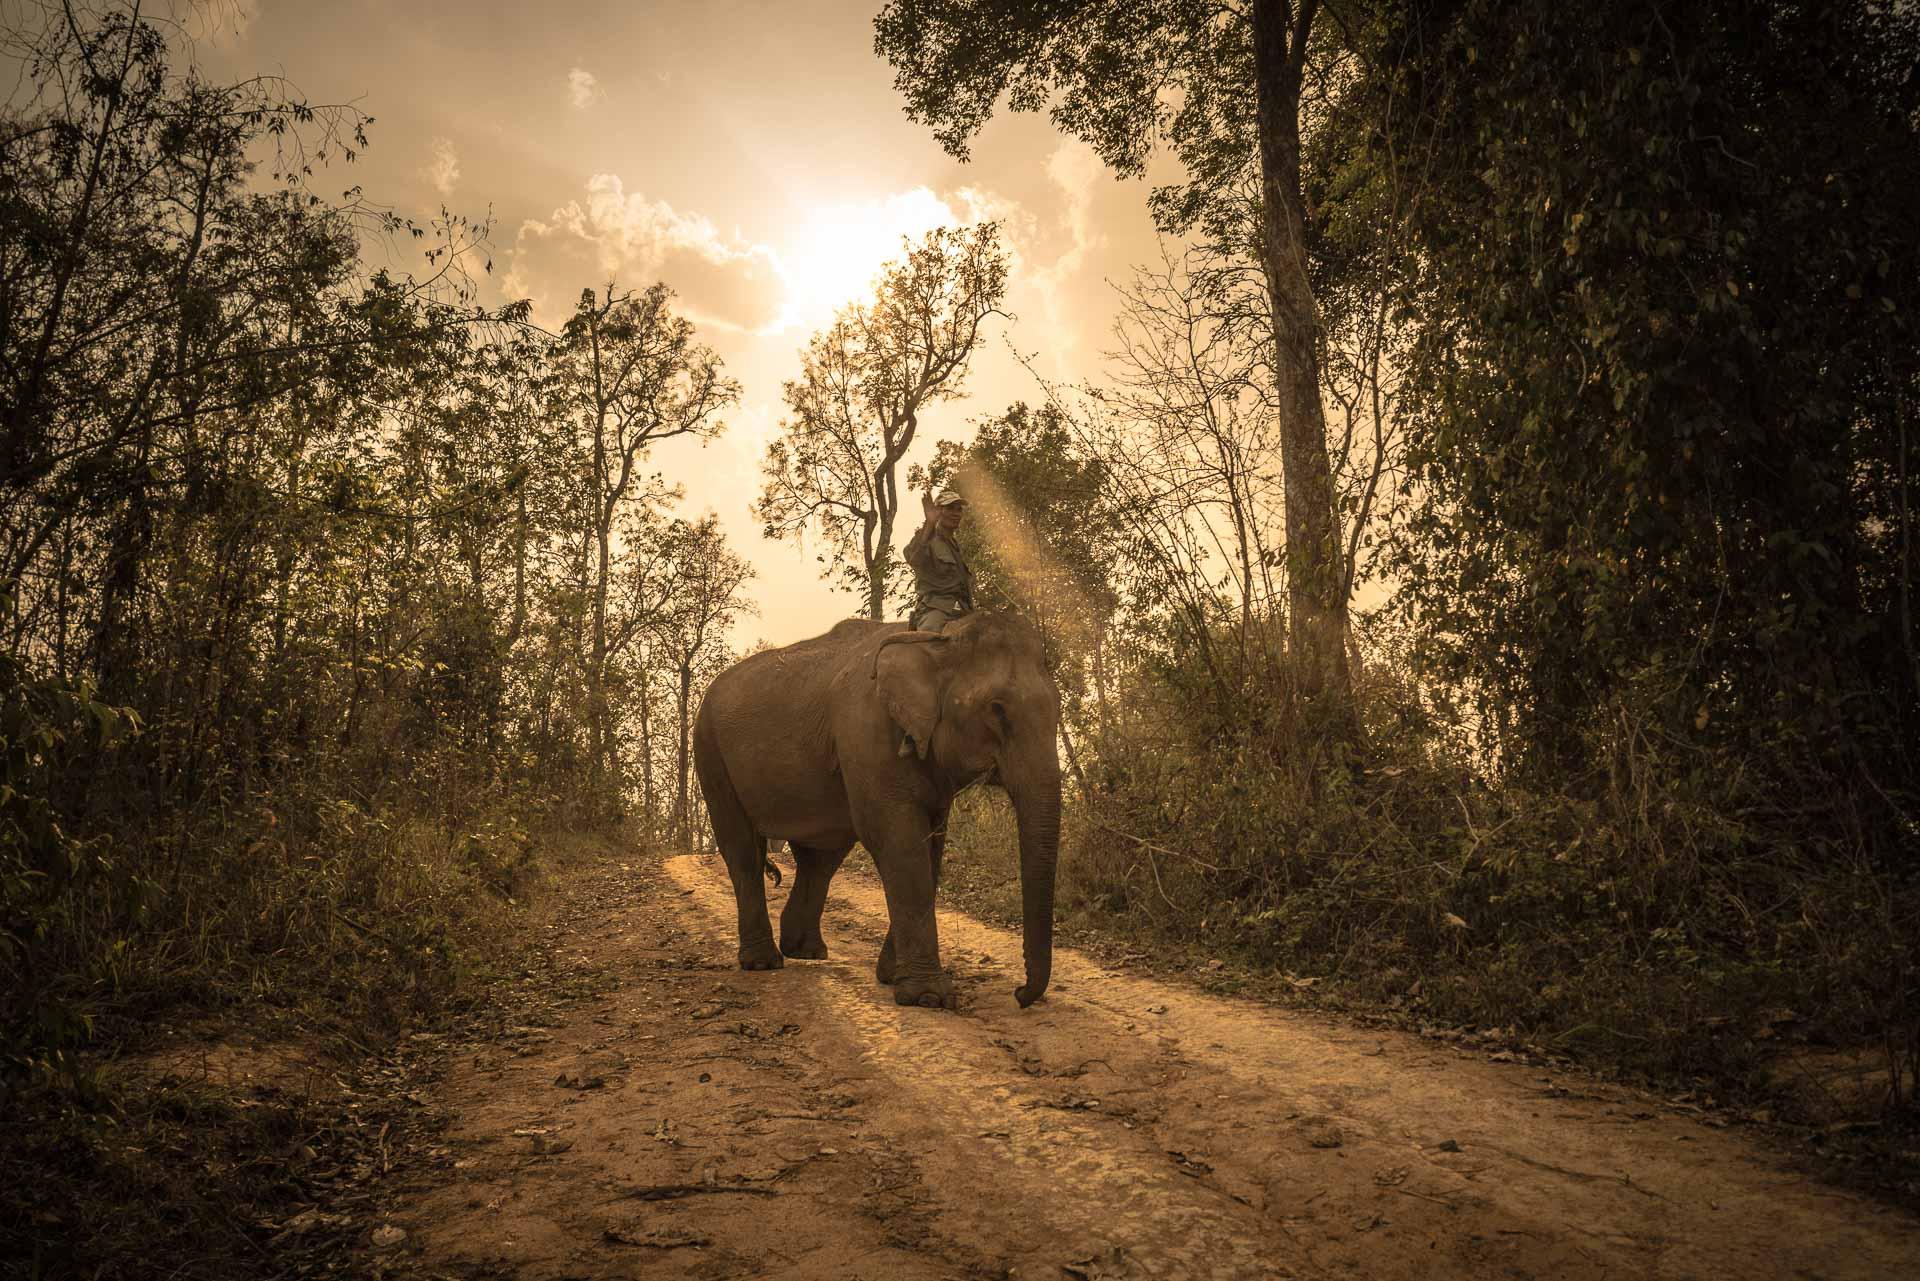 Lesvoyageuses-volontariat-centre-conservation-elephants-laos-64